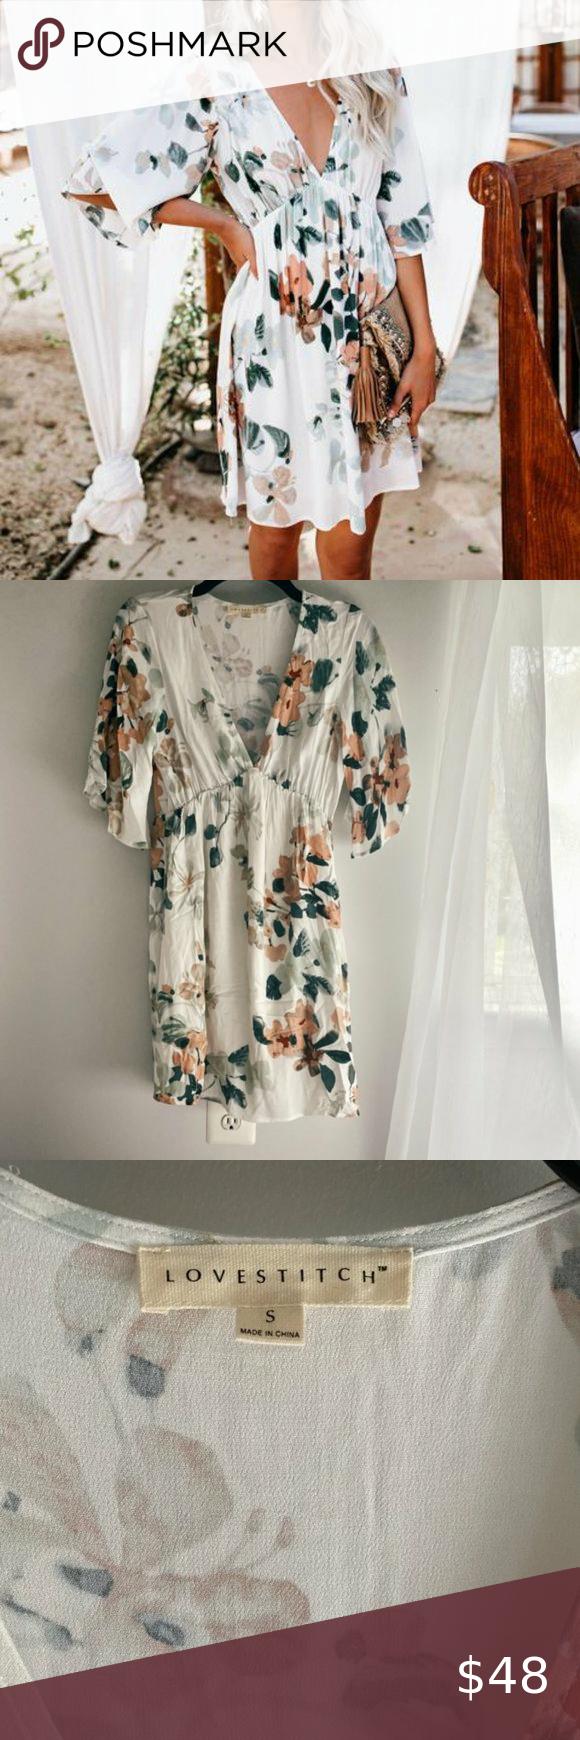 Vici Lovestitch Floral Print Babydoll Dress Vici Lovestitch Floral Print Babydoll Dress Size S Nwot Gorgeous Colorful Babydoll Dress Clothes Design Fashion [ 1740 x 580 Pixel ]